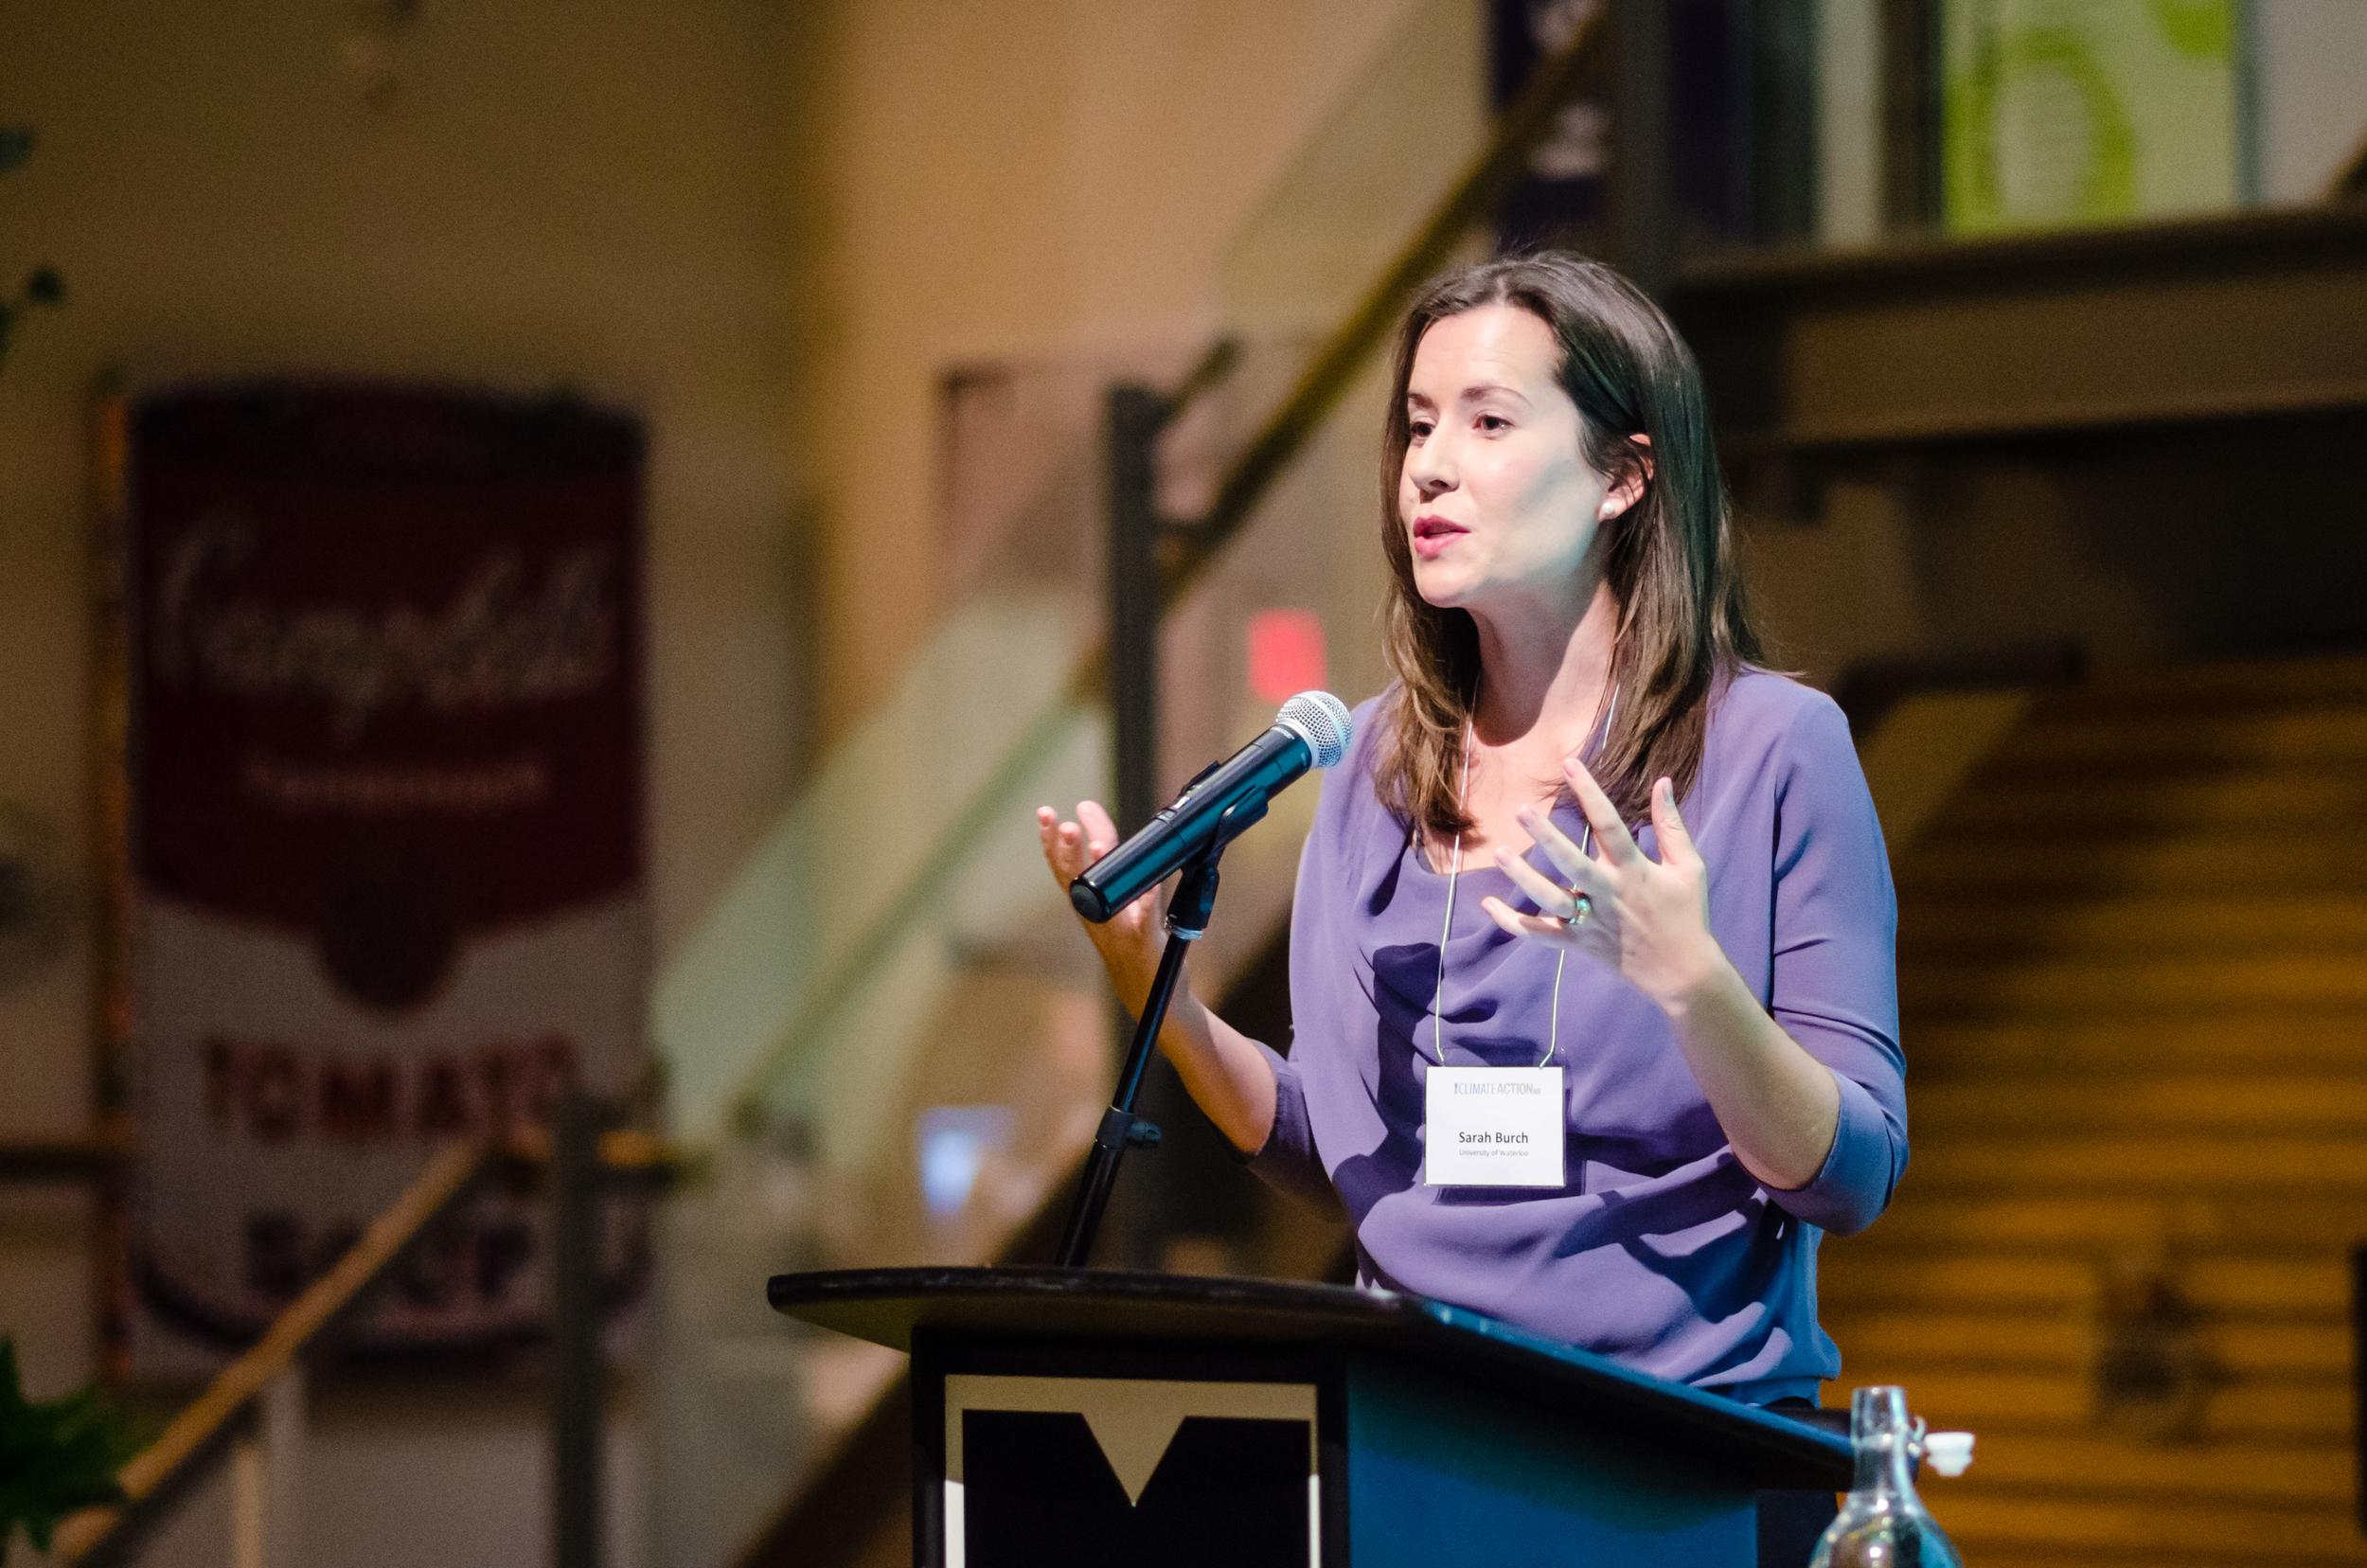 University of Waterloo Professor  Sarah Burch discusses case studies of other successful sustainability initiatives in urban communities.